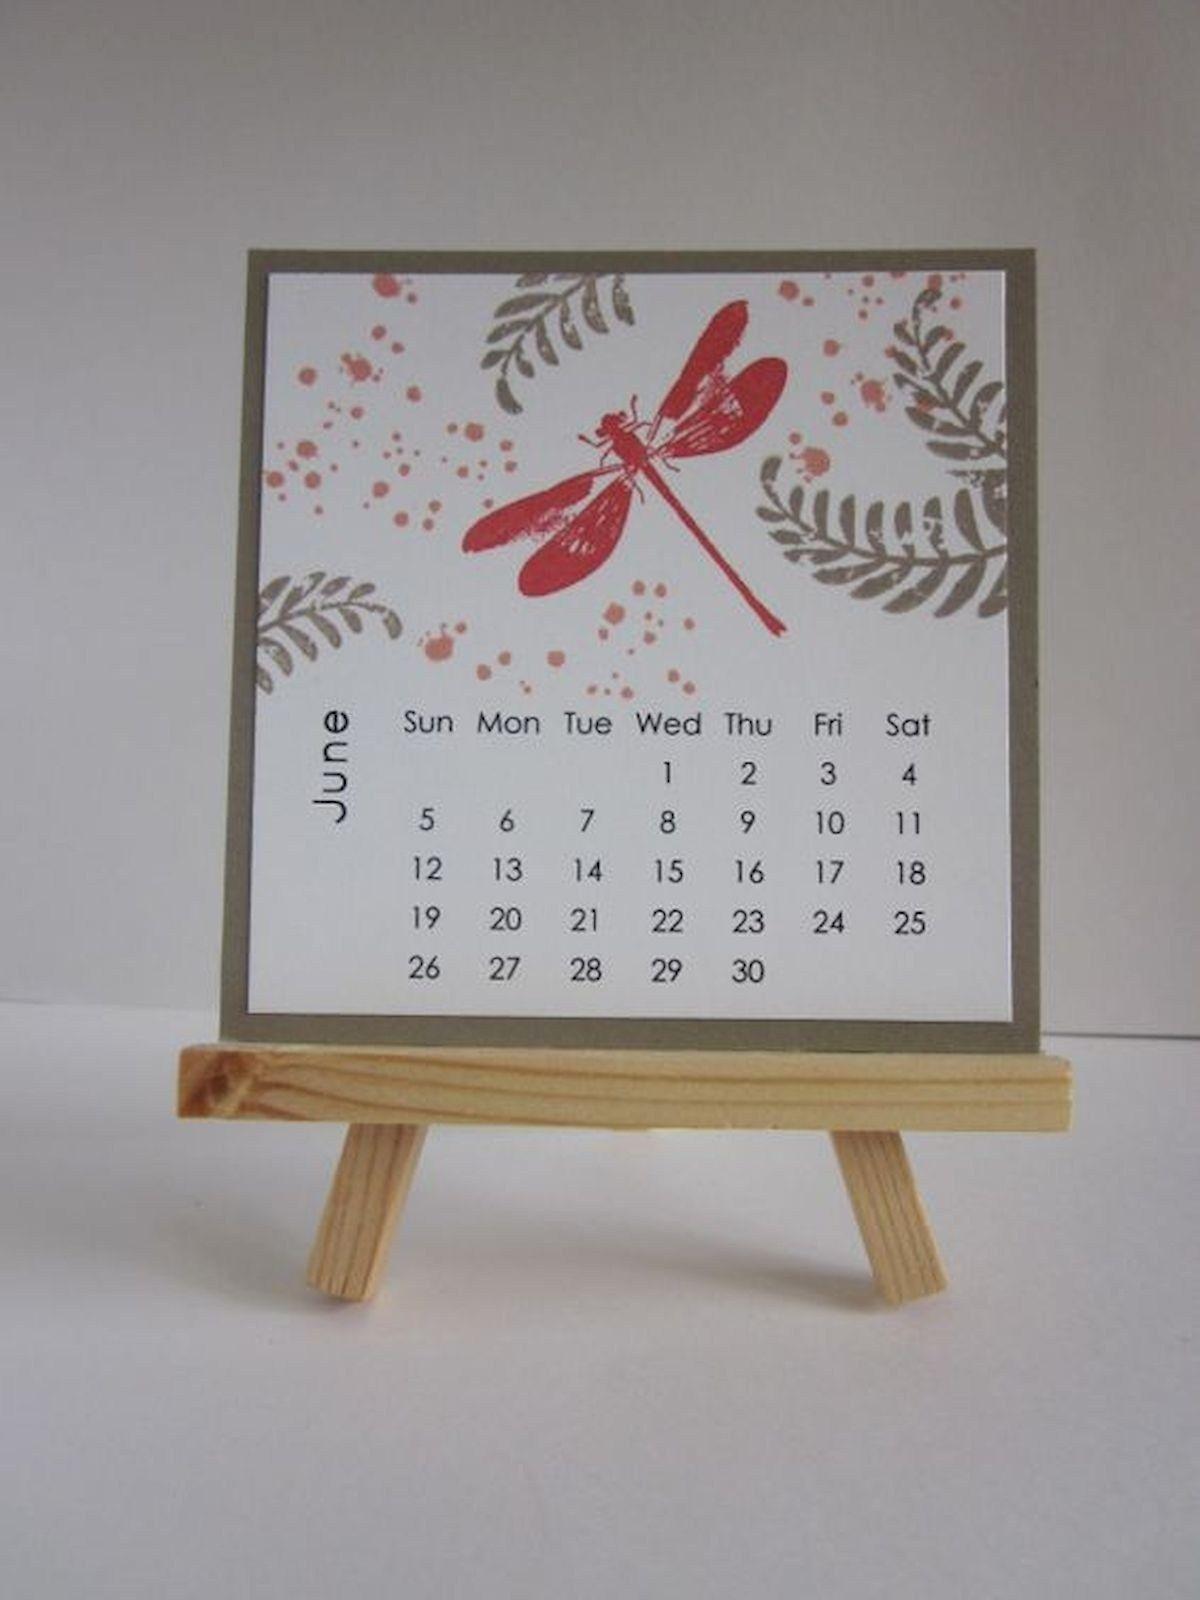 35 Gorgeous Diy Desk Calendar Ideas 29 Diy 35 Gorgeous Diy